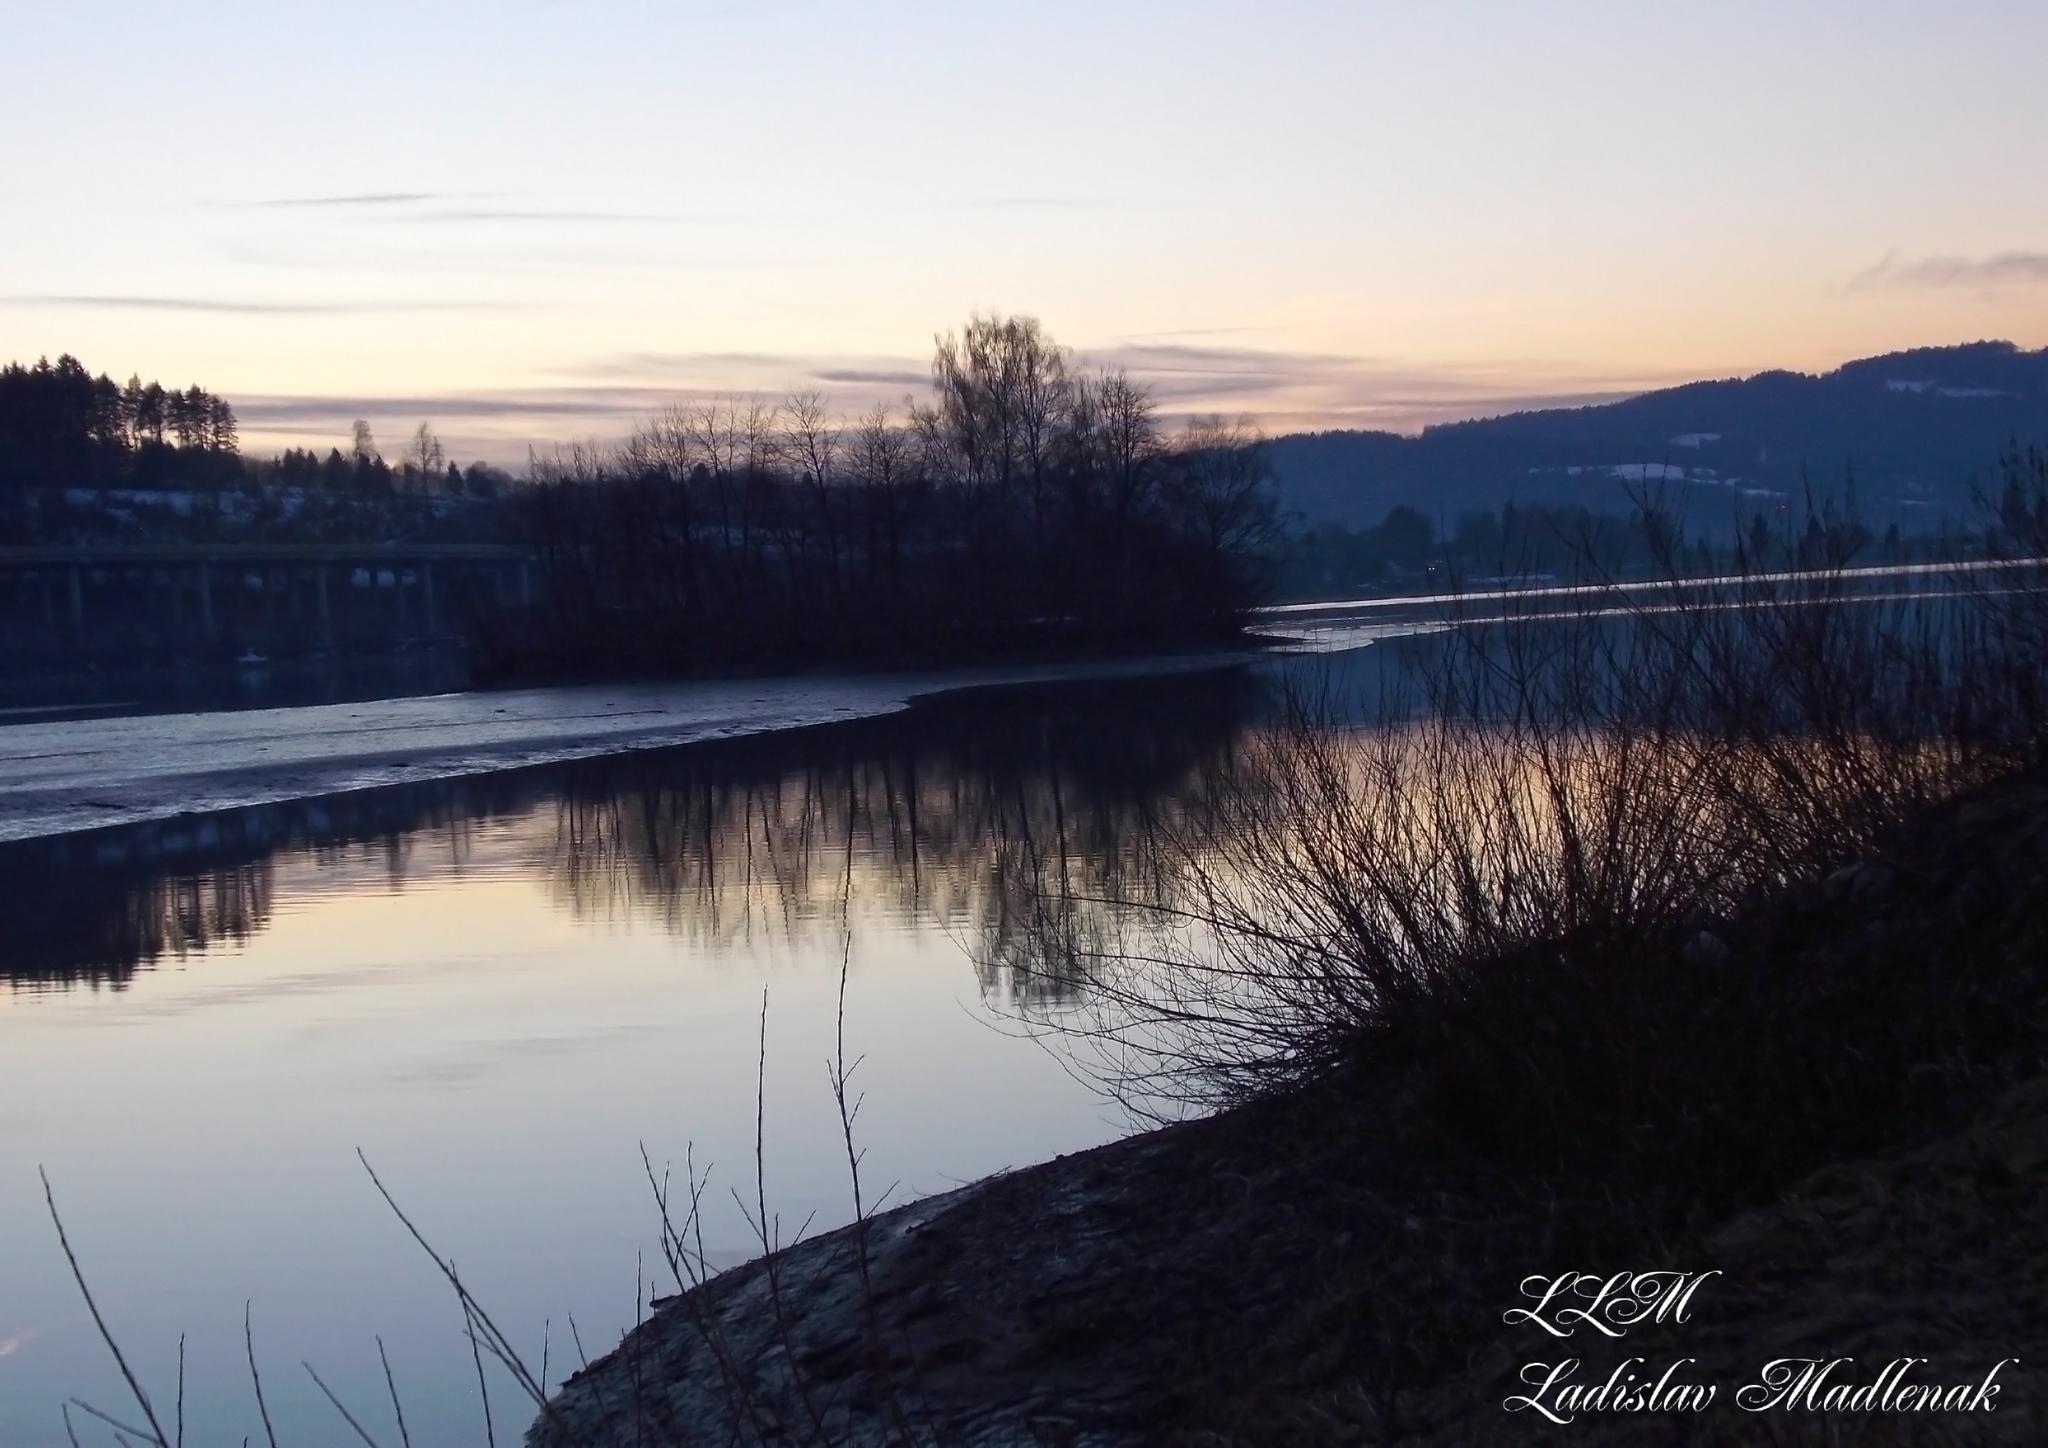 Colorful sunset by LLadislav Madlenak